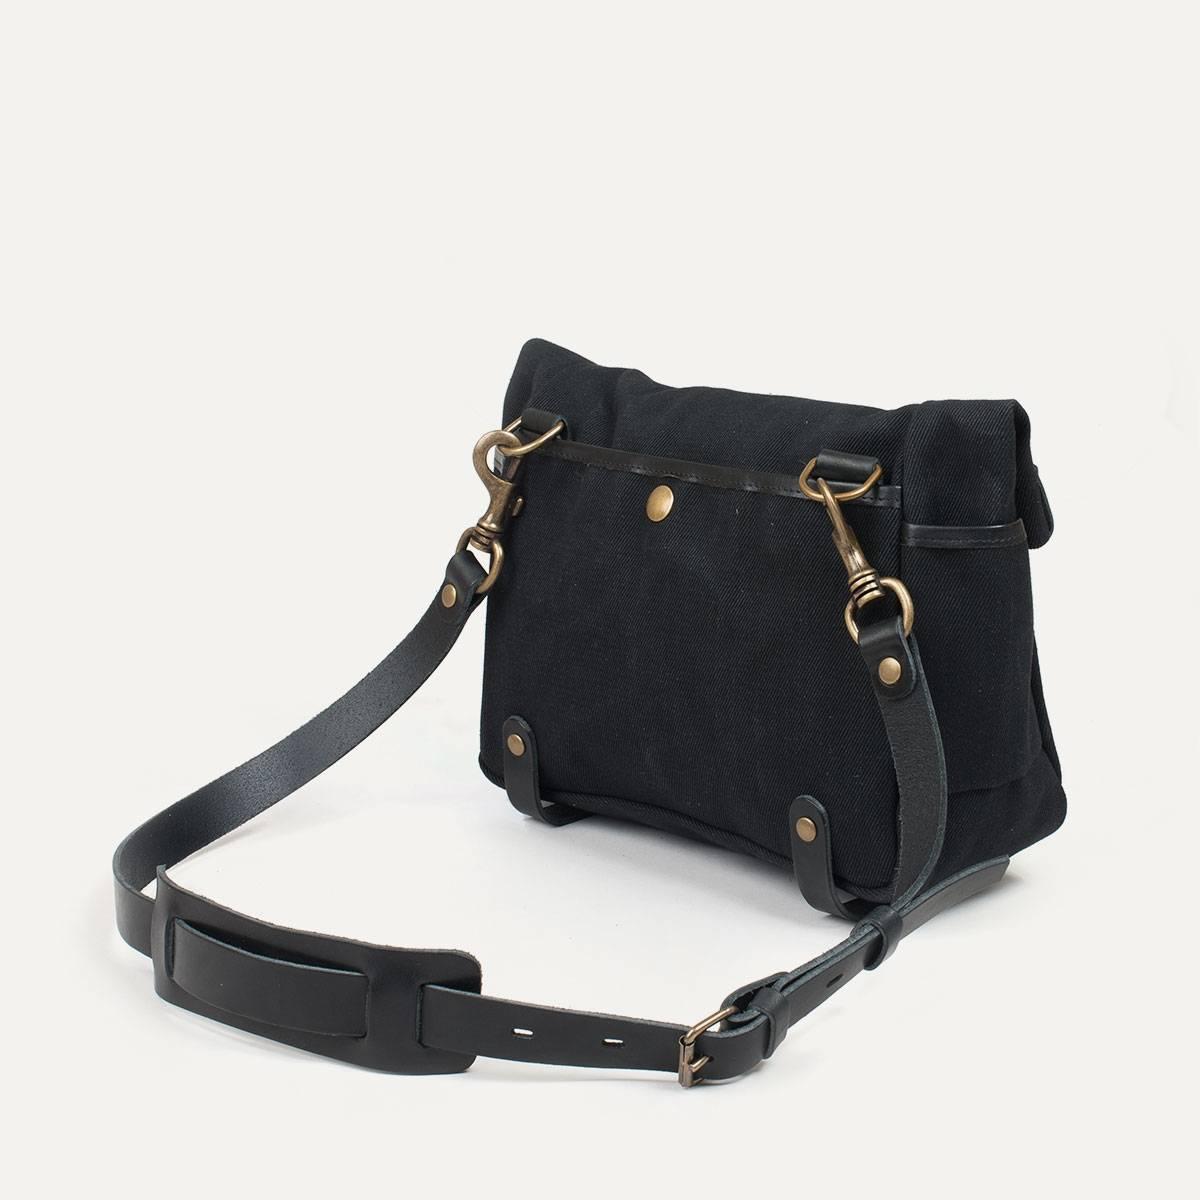 Gibus tool bag - Black (image n°3)